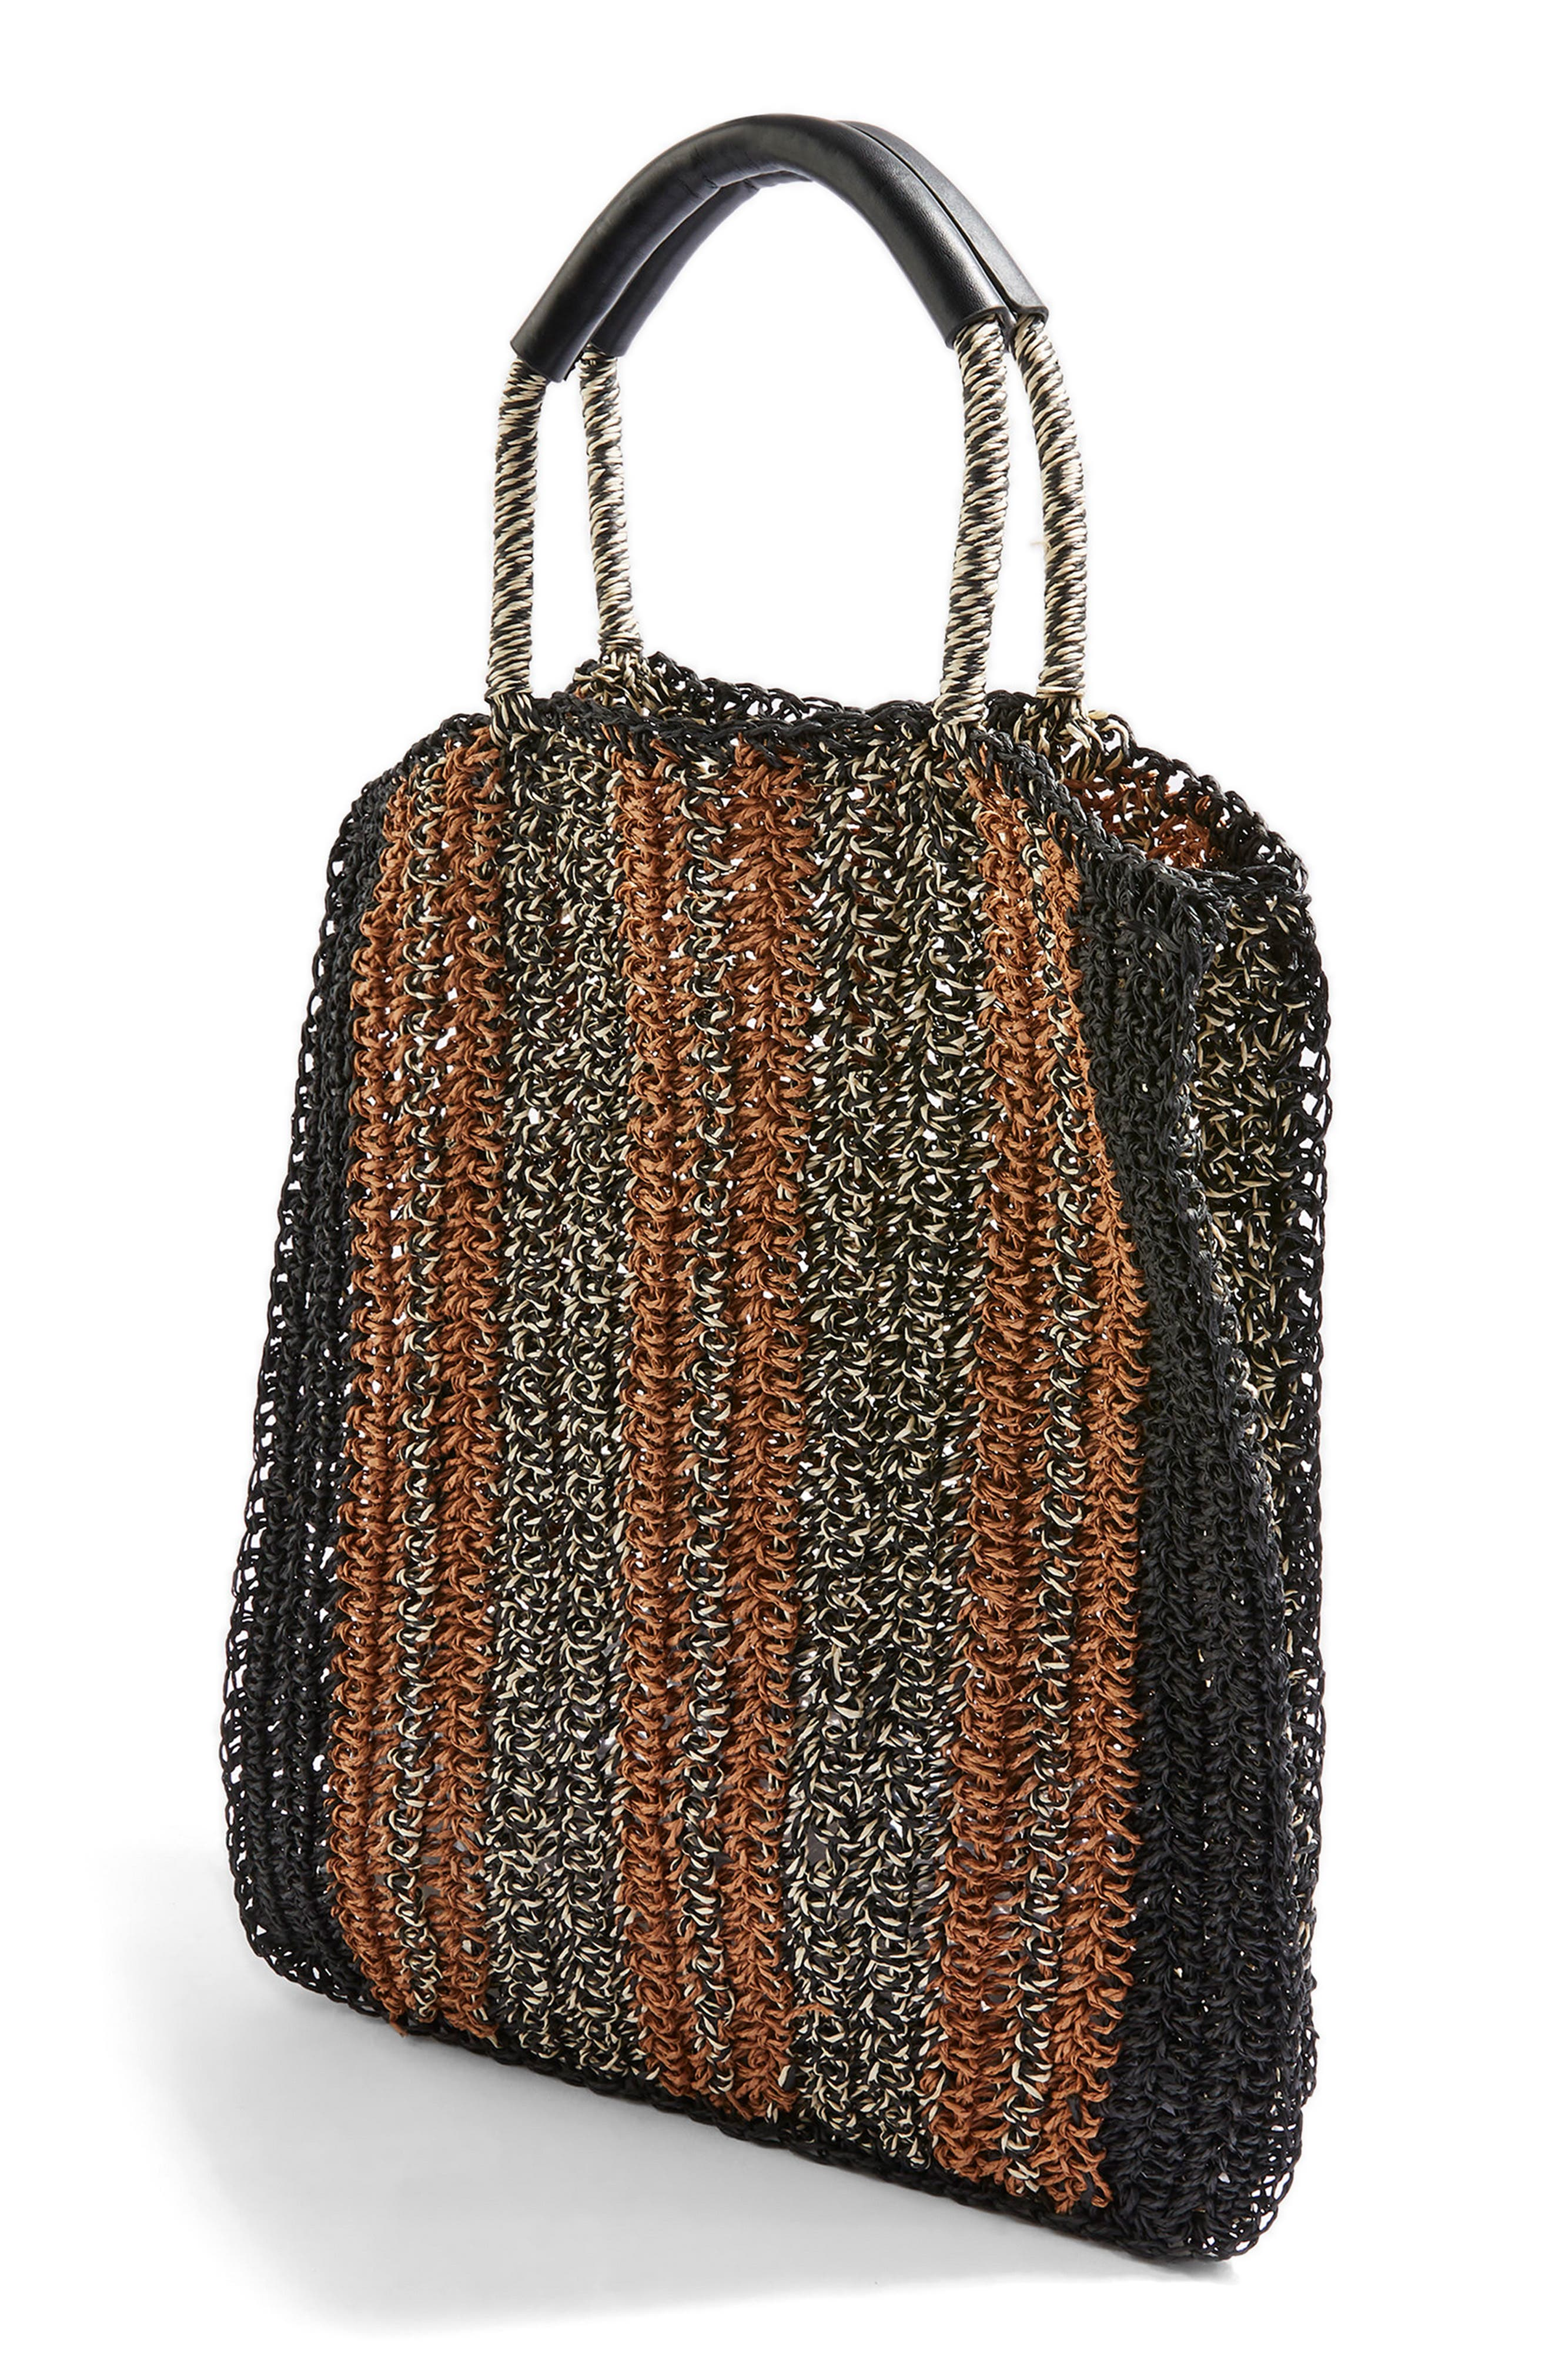 Bath Stripe Straw Tote Bag,                             Alternate thumbnail 3, color,                             Black Multi